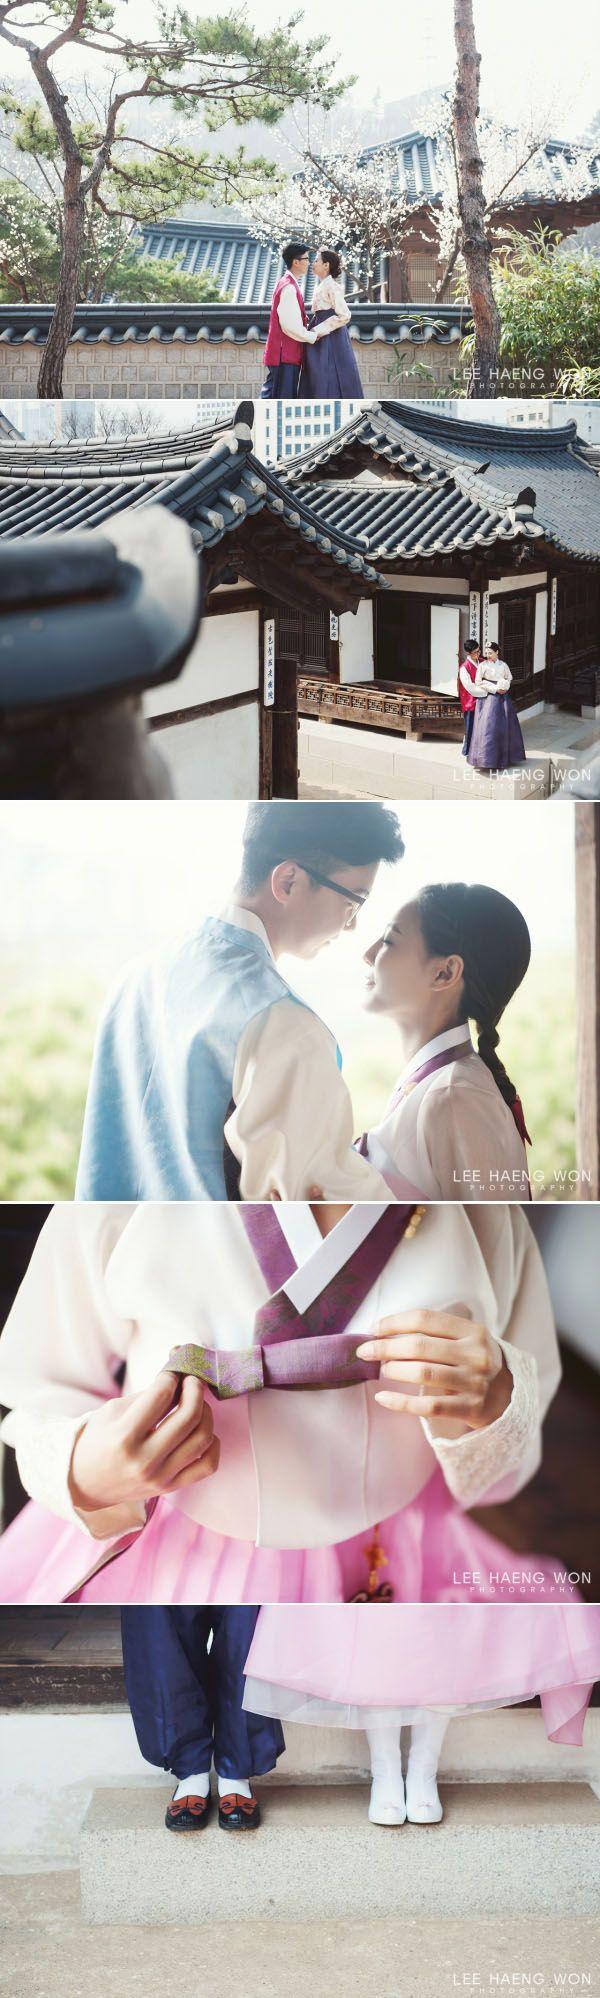 Hanbok wedding // Lee Haeng Won Photography on OneThreeOneFour // http://www.onethreeonefour.com/listing/LeeHaengWonPhotography/55a227361d502d607a8a4096